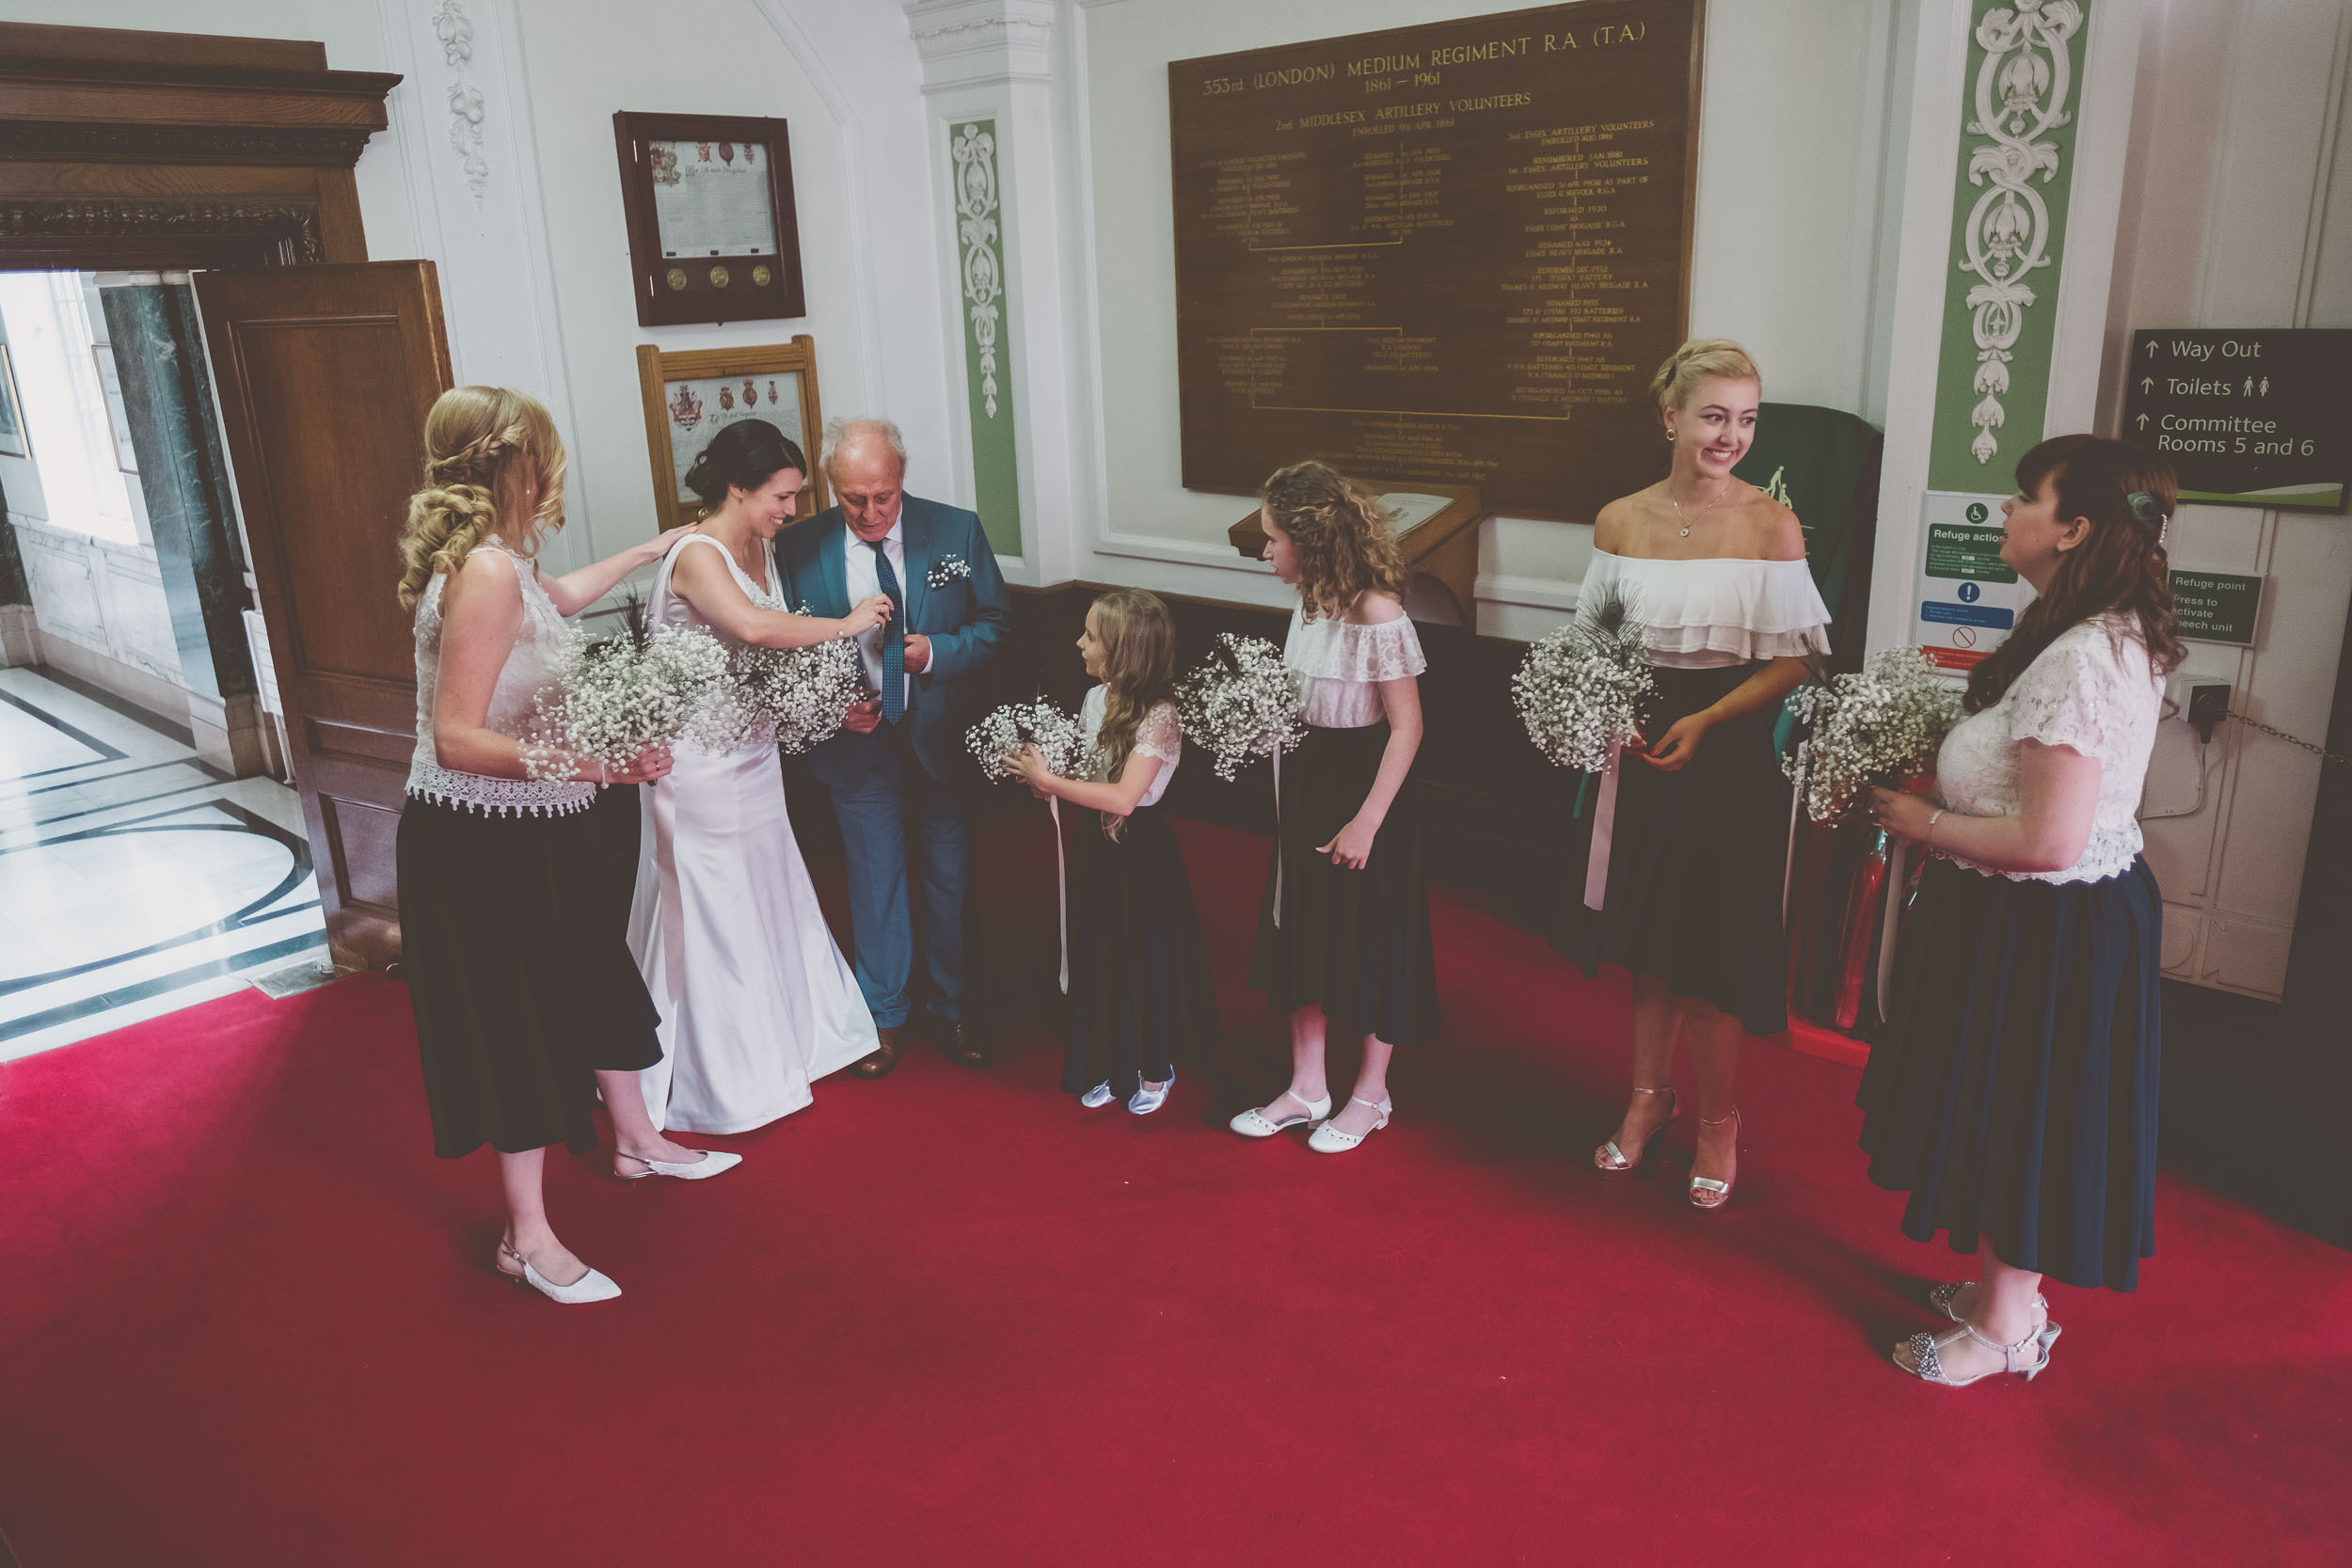 islington-town-hall-4th-floor-studios-wedding038.jpg